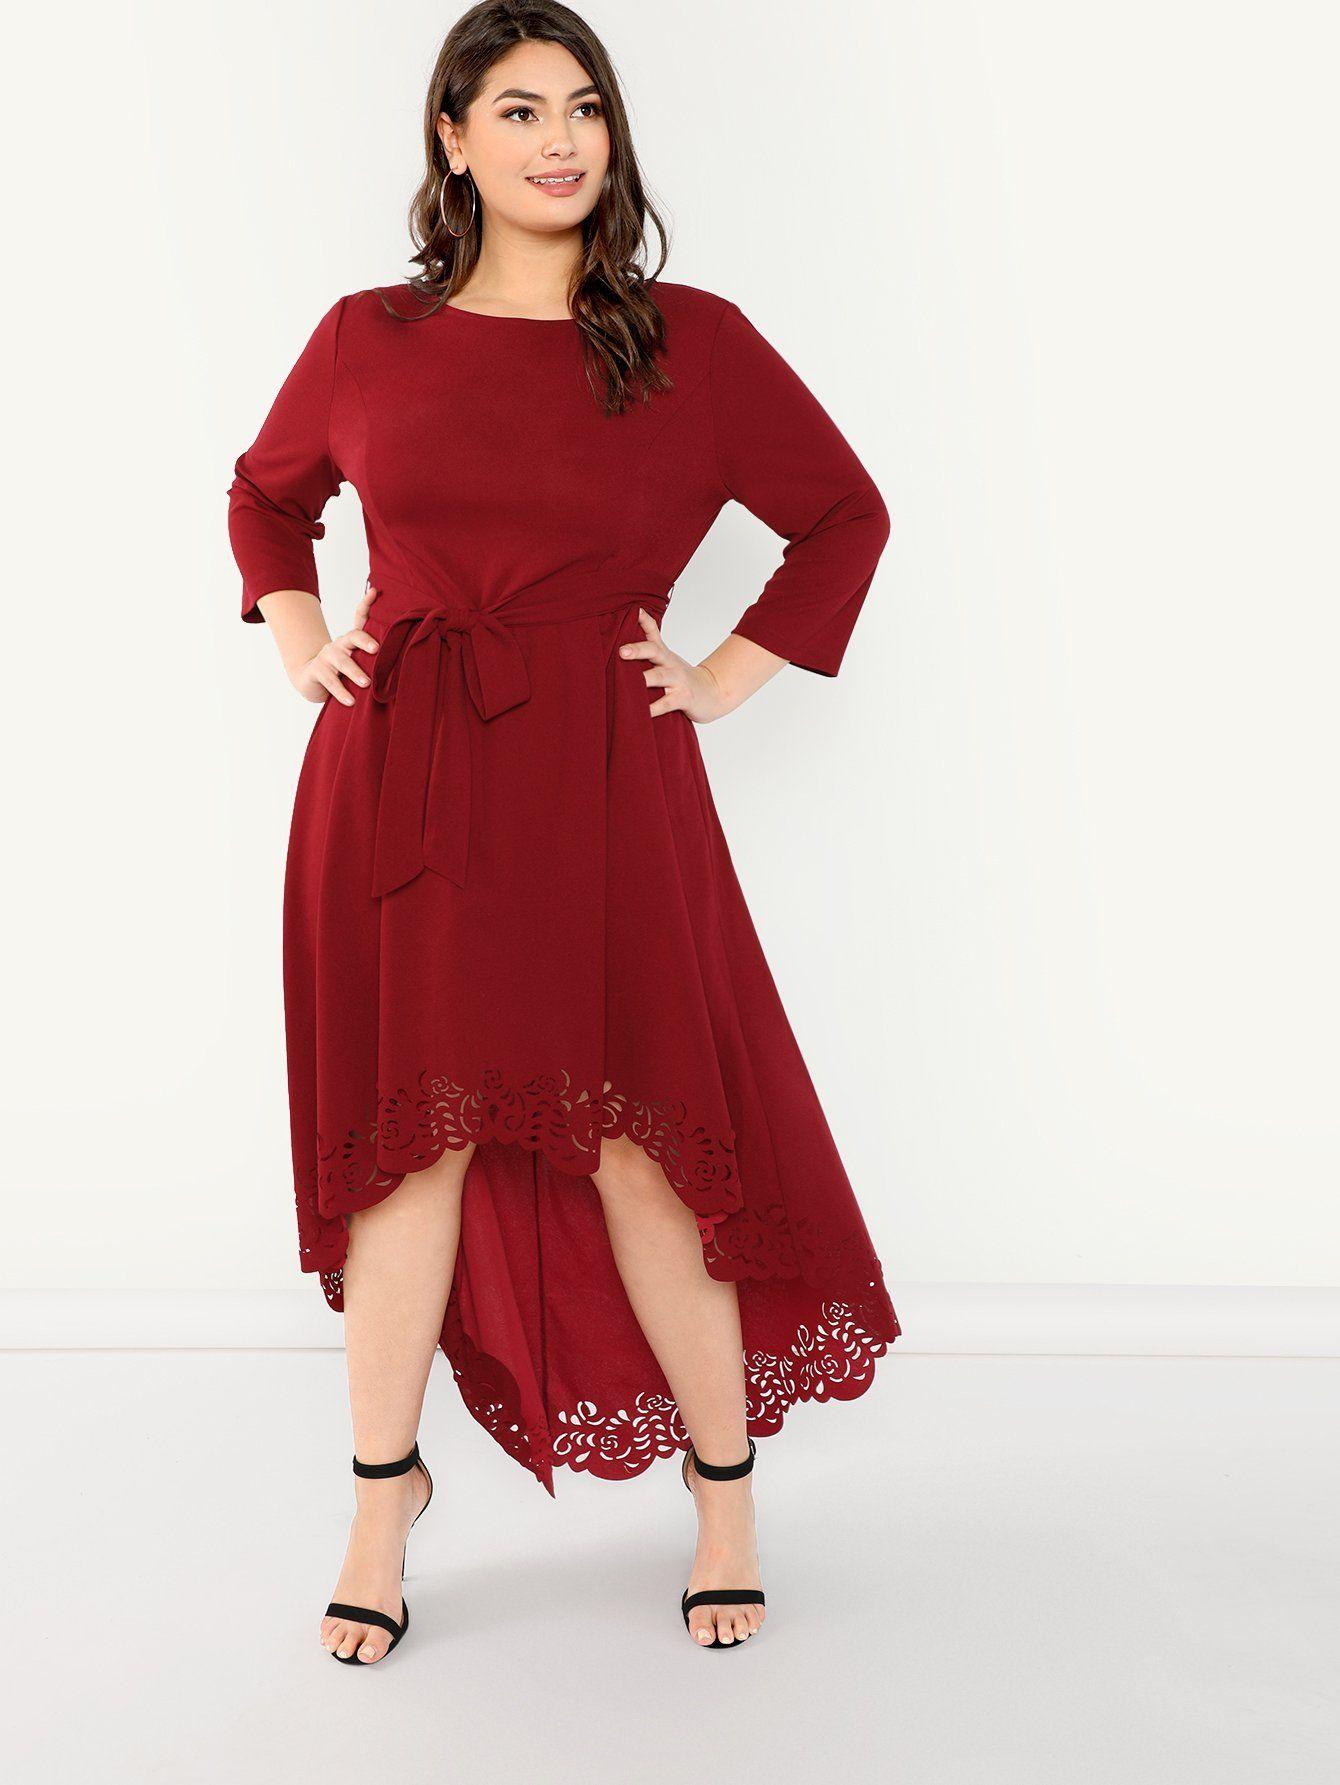 bf641a930a8 Plus Size Scallop Trim Laser Cut High Low Burgundy Dress Multi Sizes ...